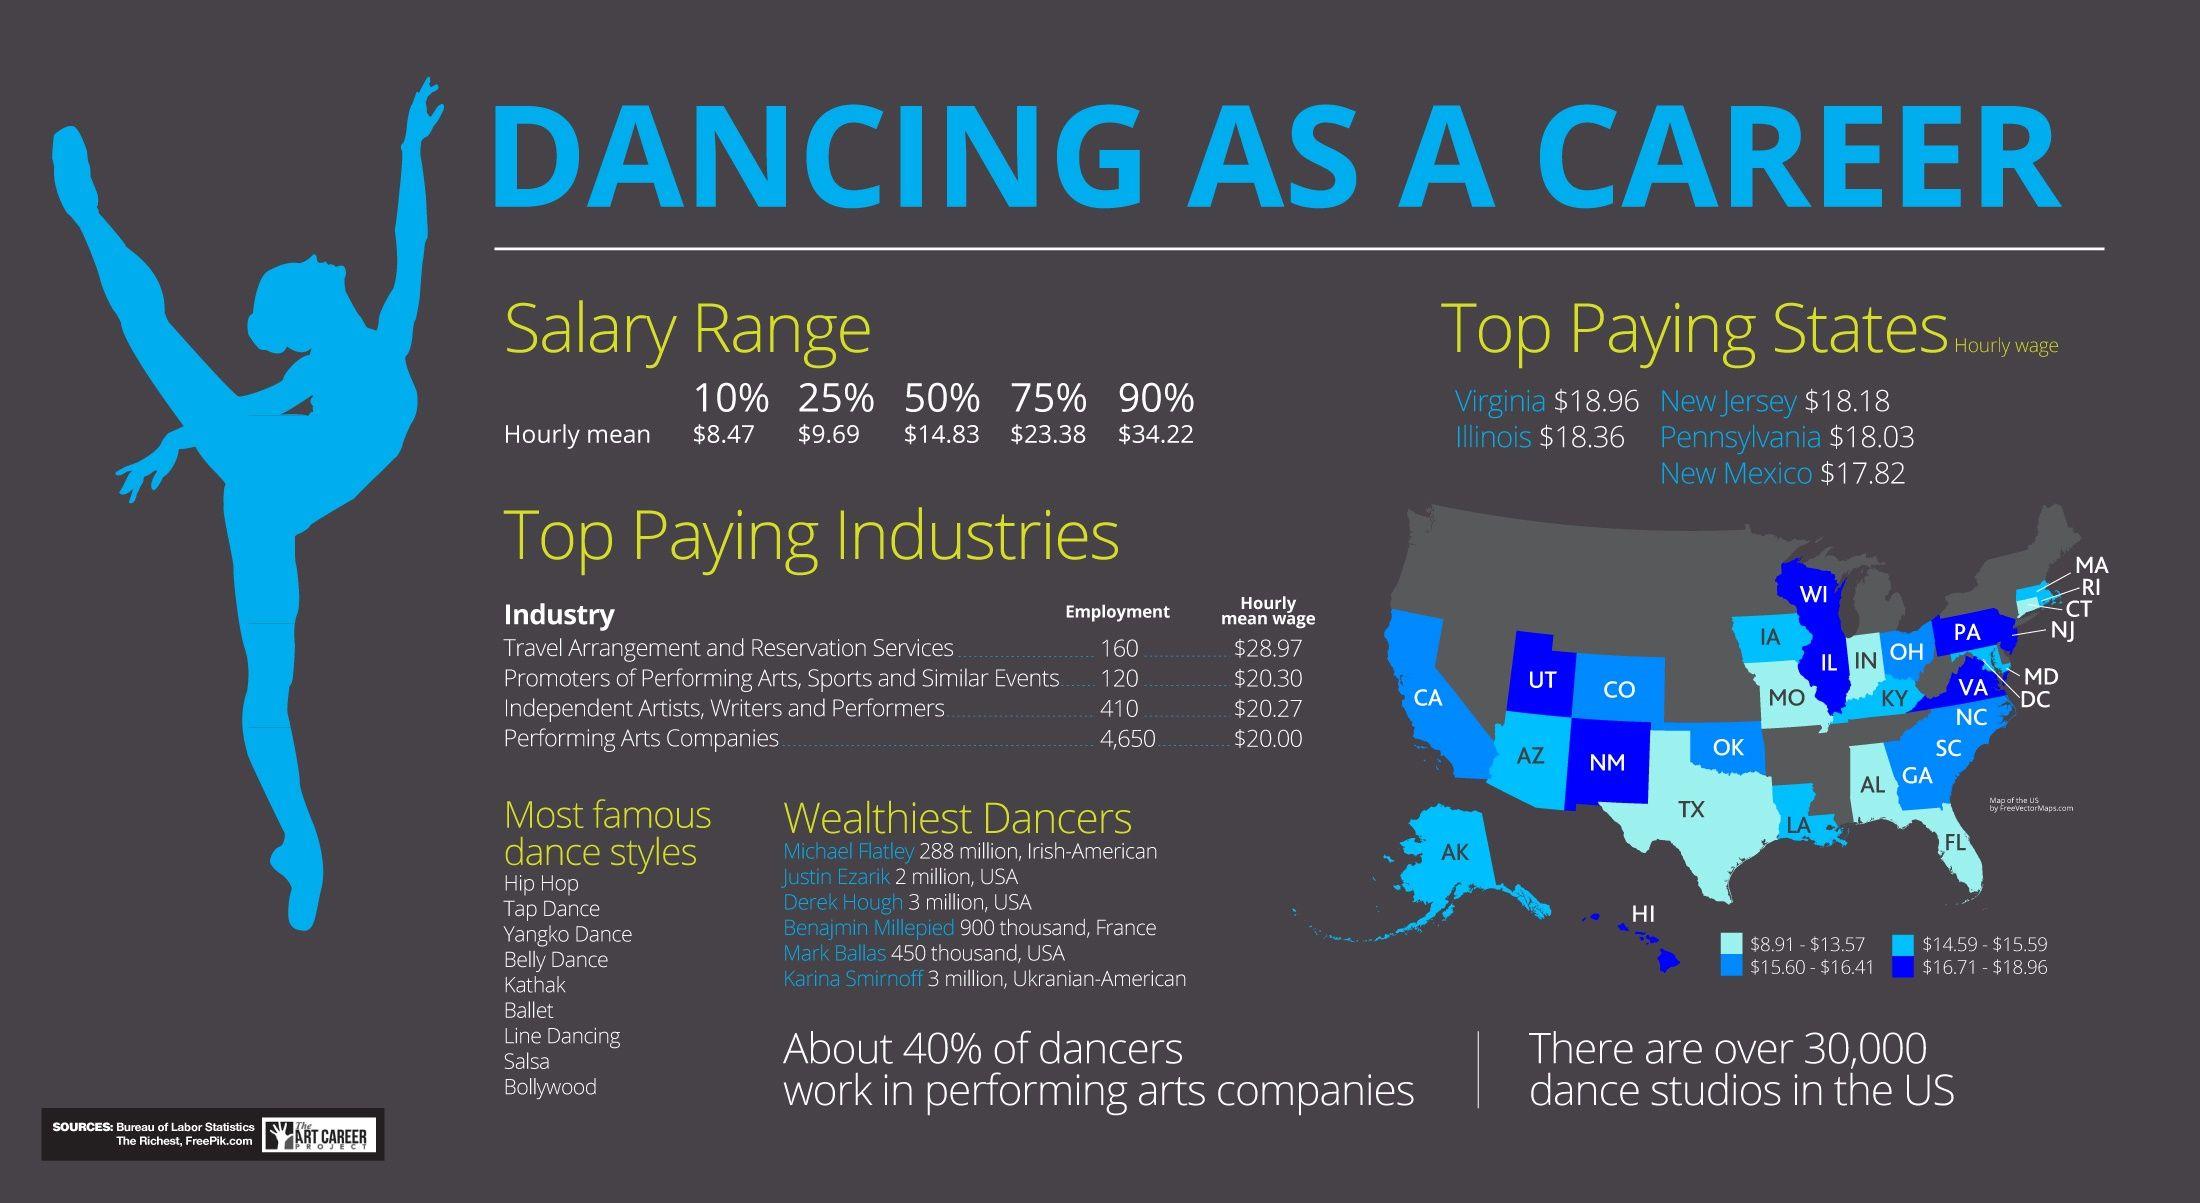 Dancer top paying industries states salaries